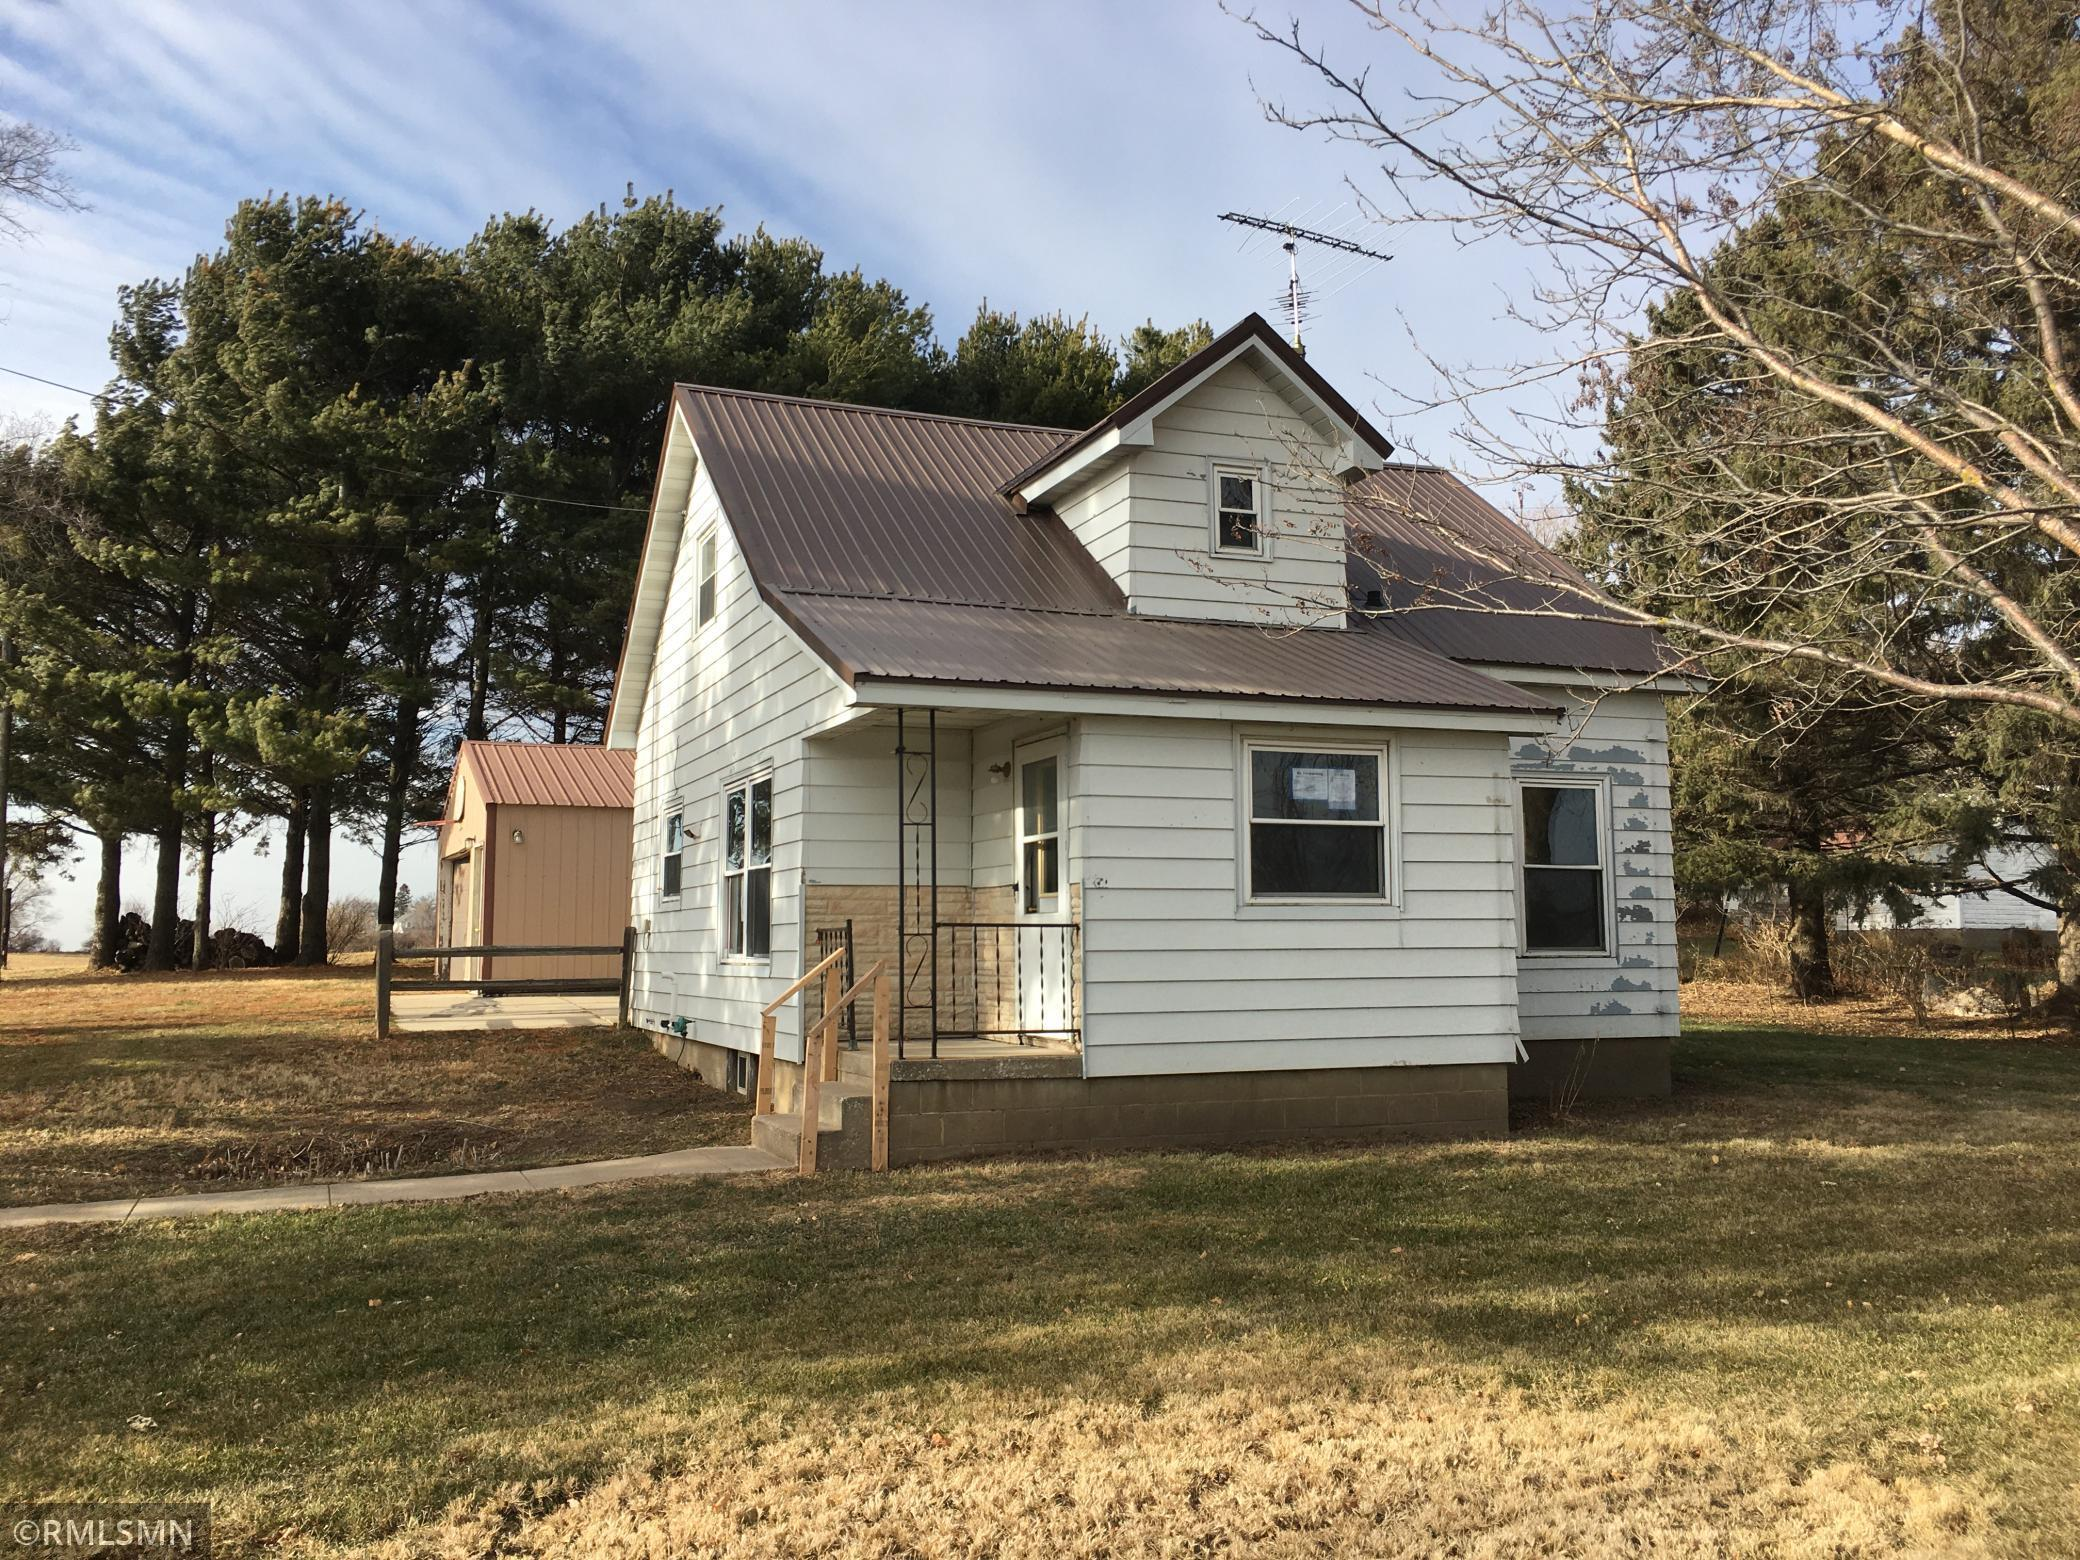 15317 County 9 Property Photo - Preston, MN real estate listing